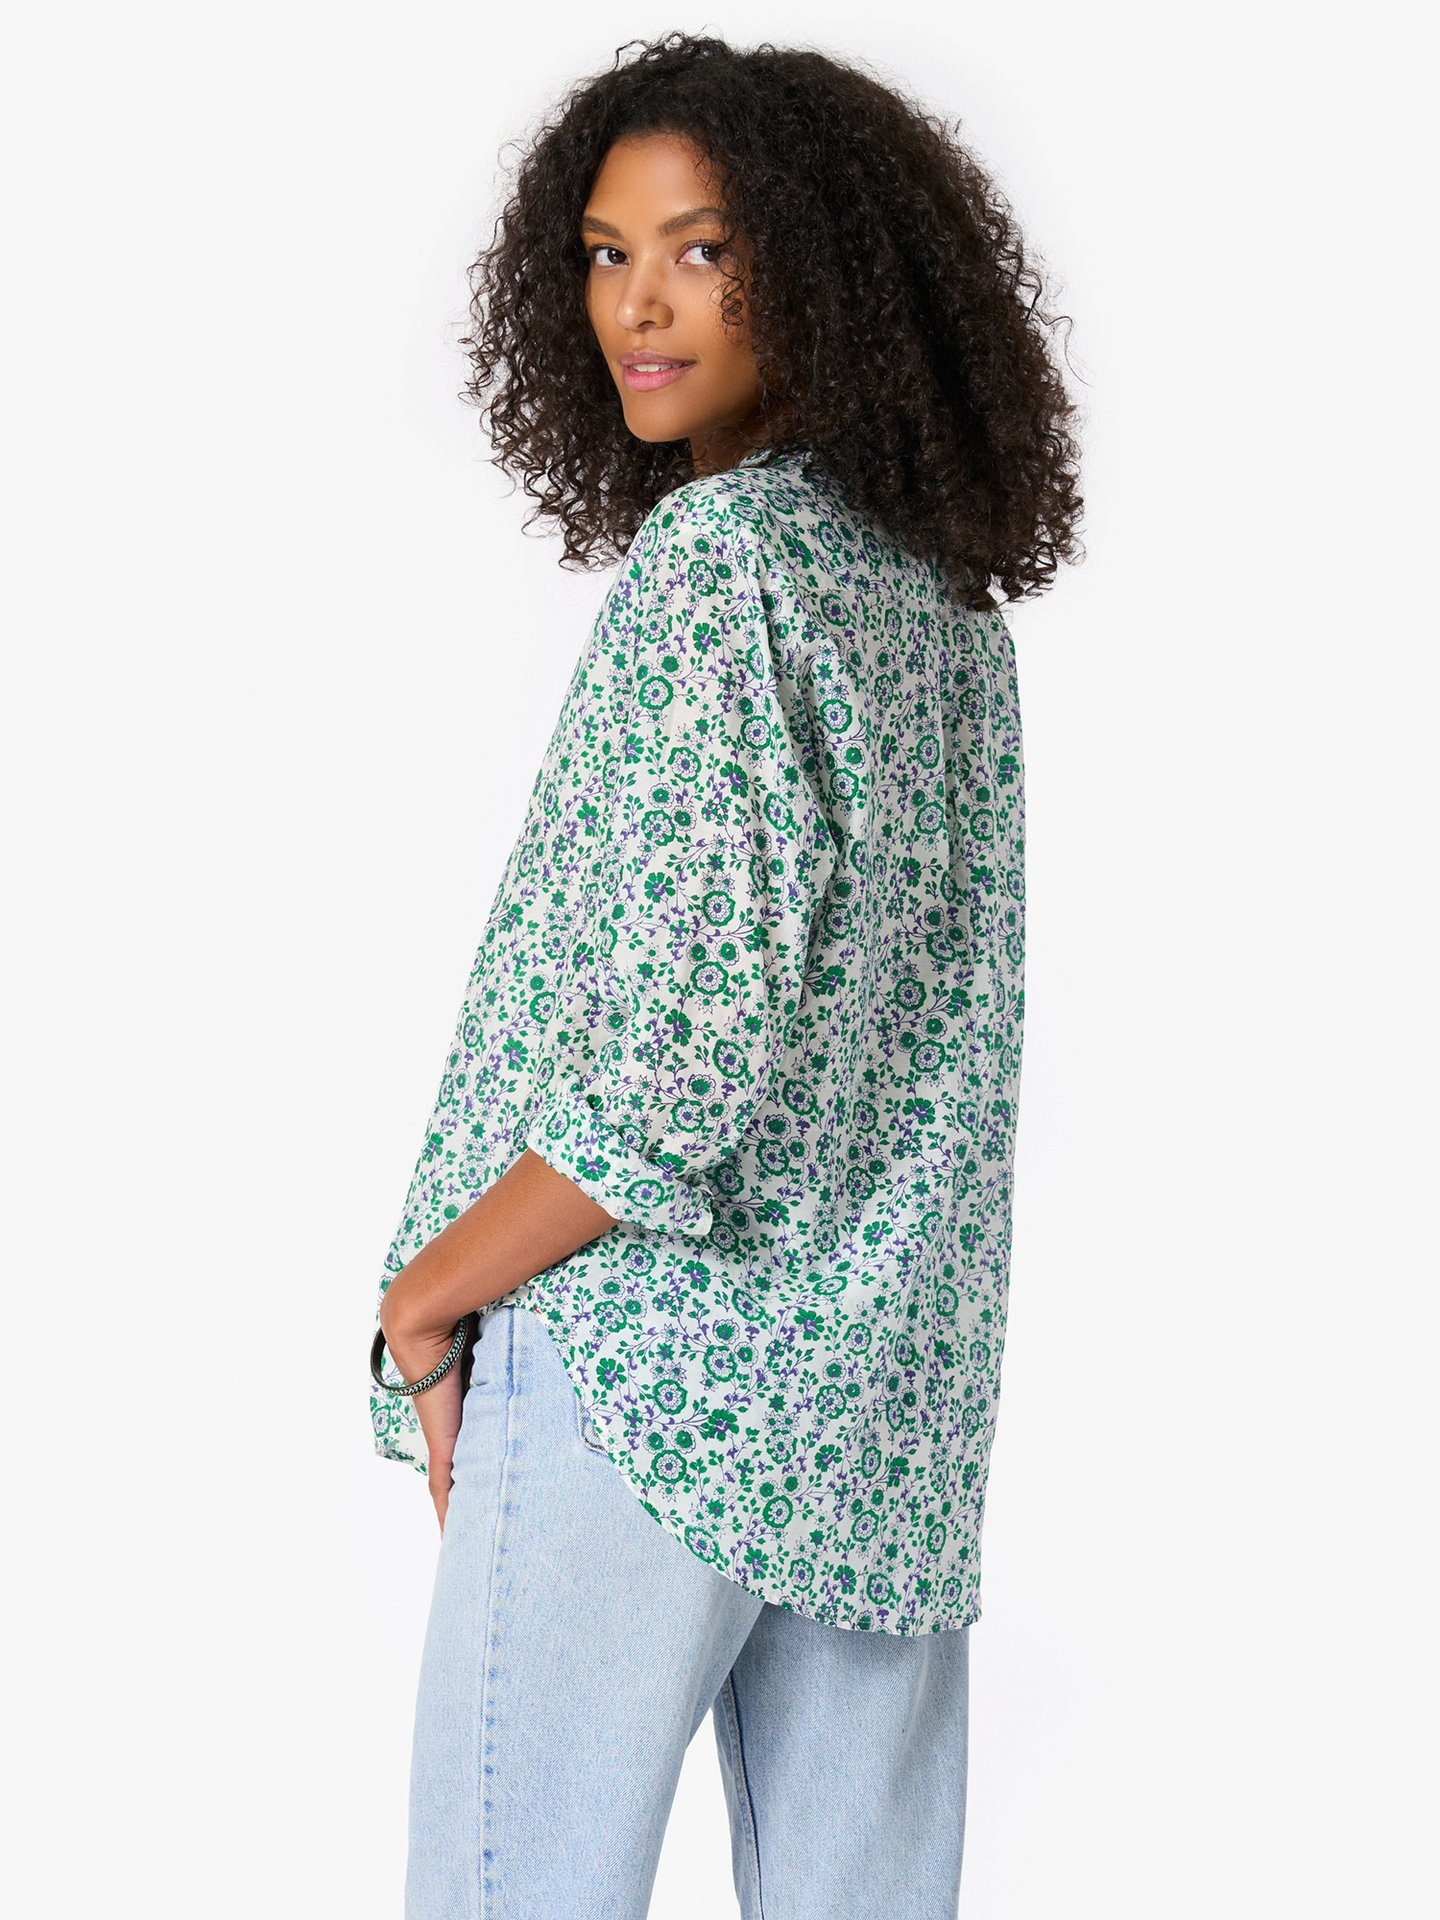 Xirena Beau Shirt Leaf